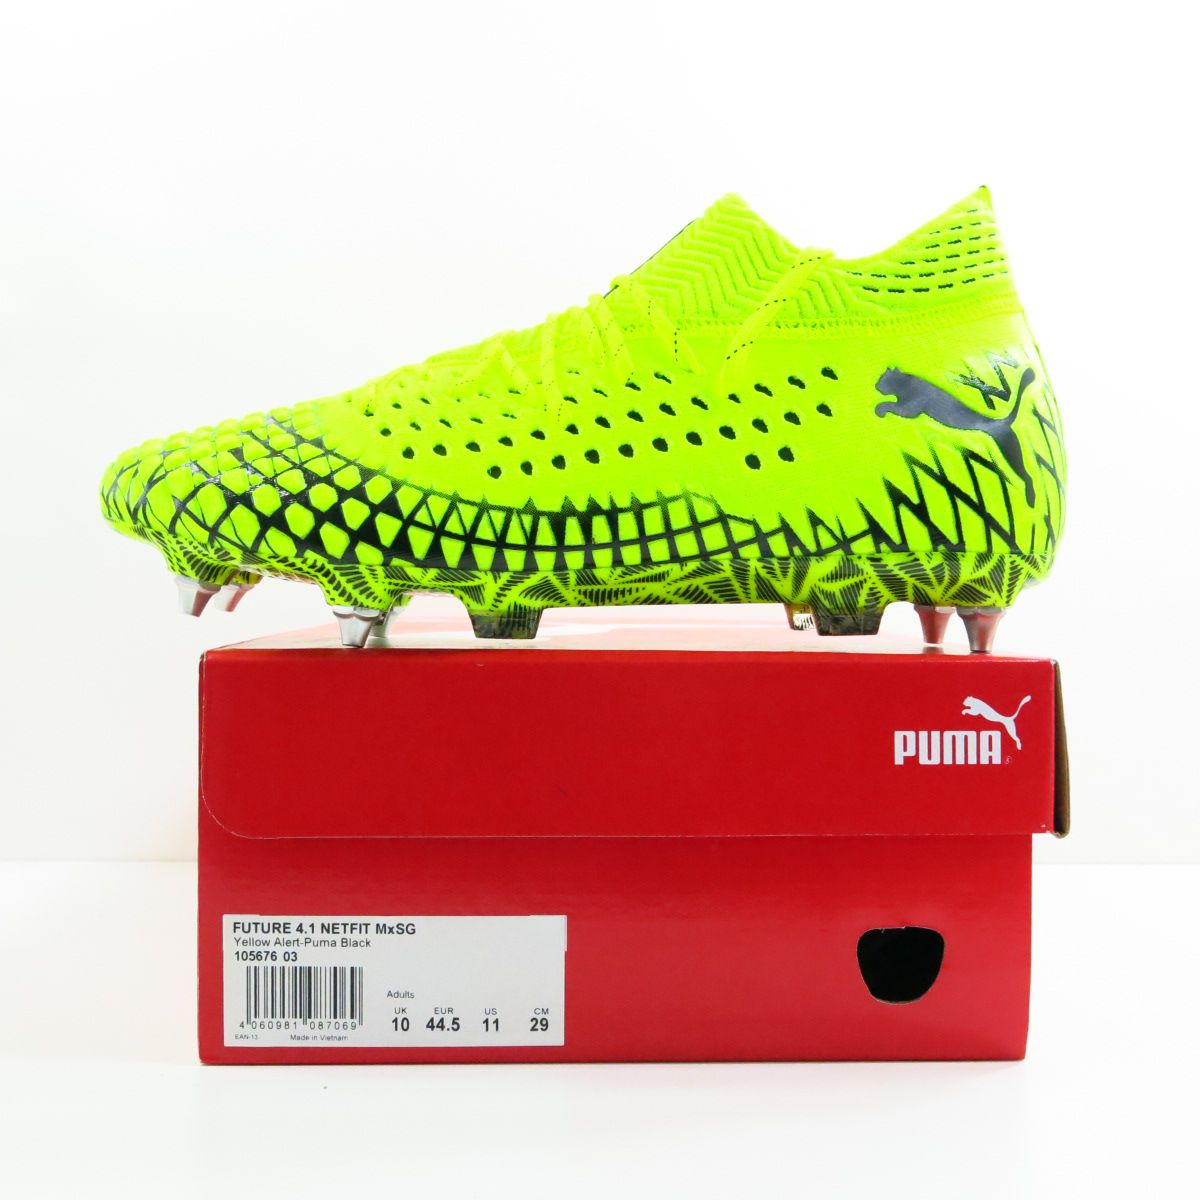 Chuteira Puma Future 4.1 Netfit Mx SG - Trava MIsta